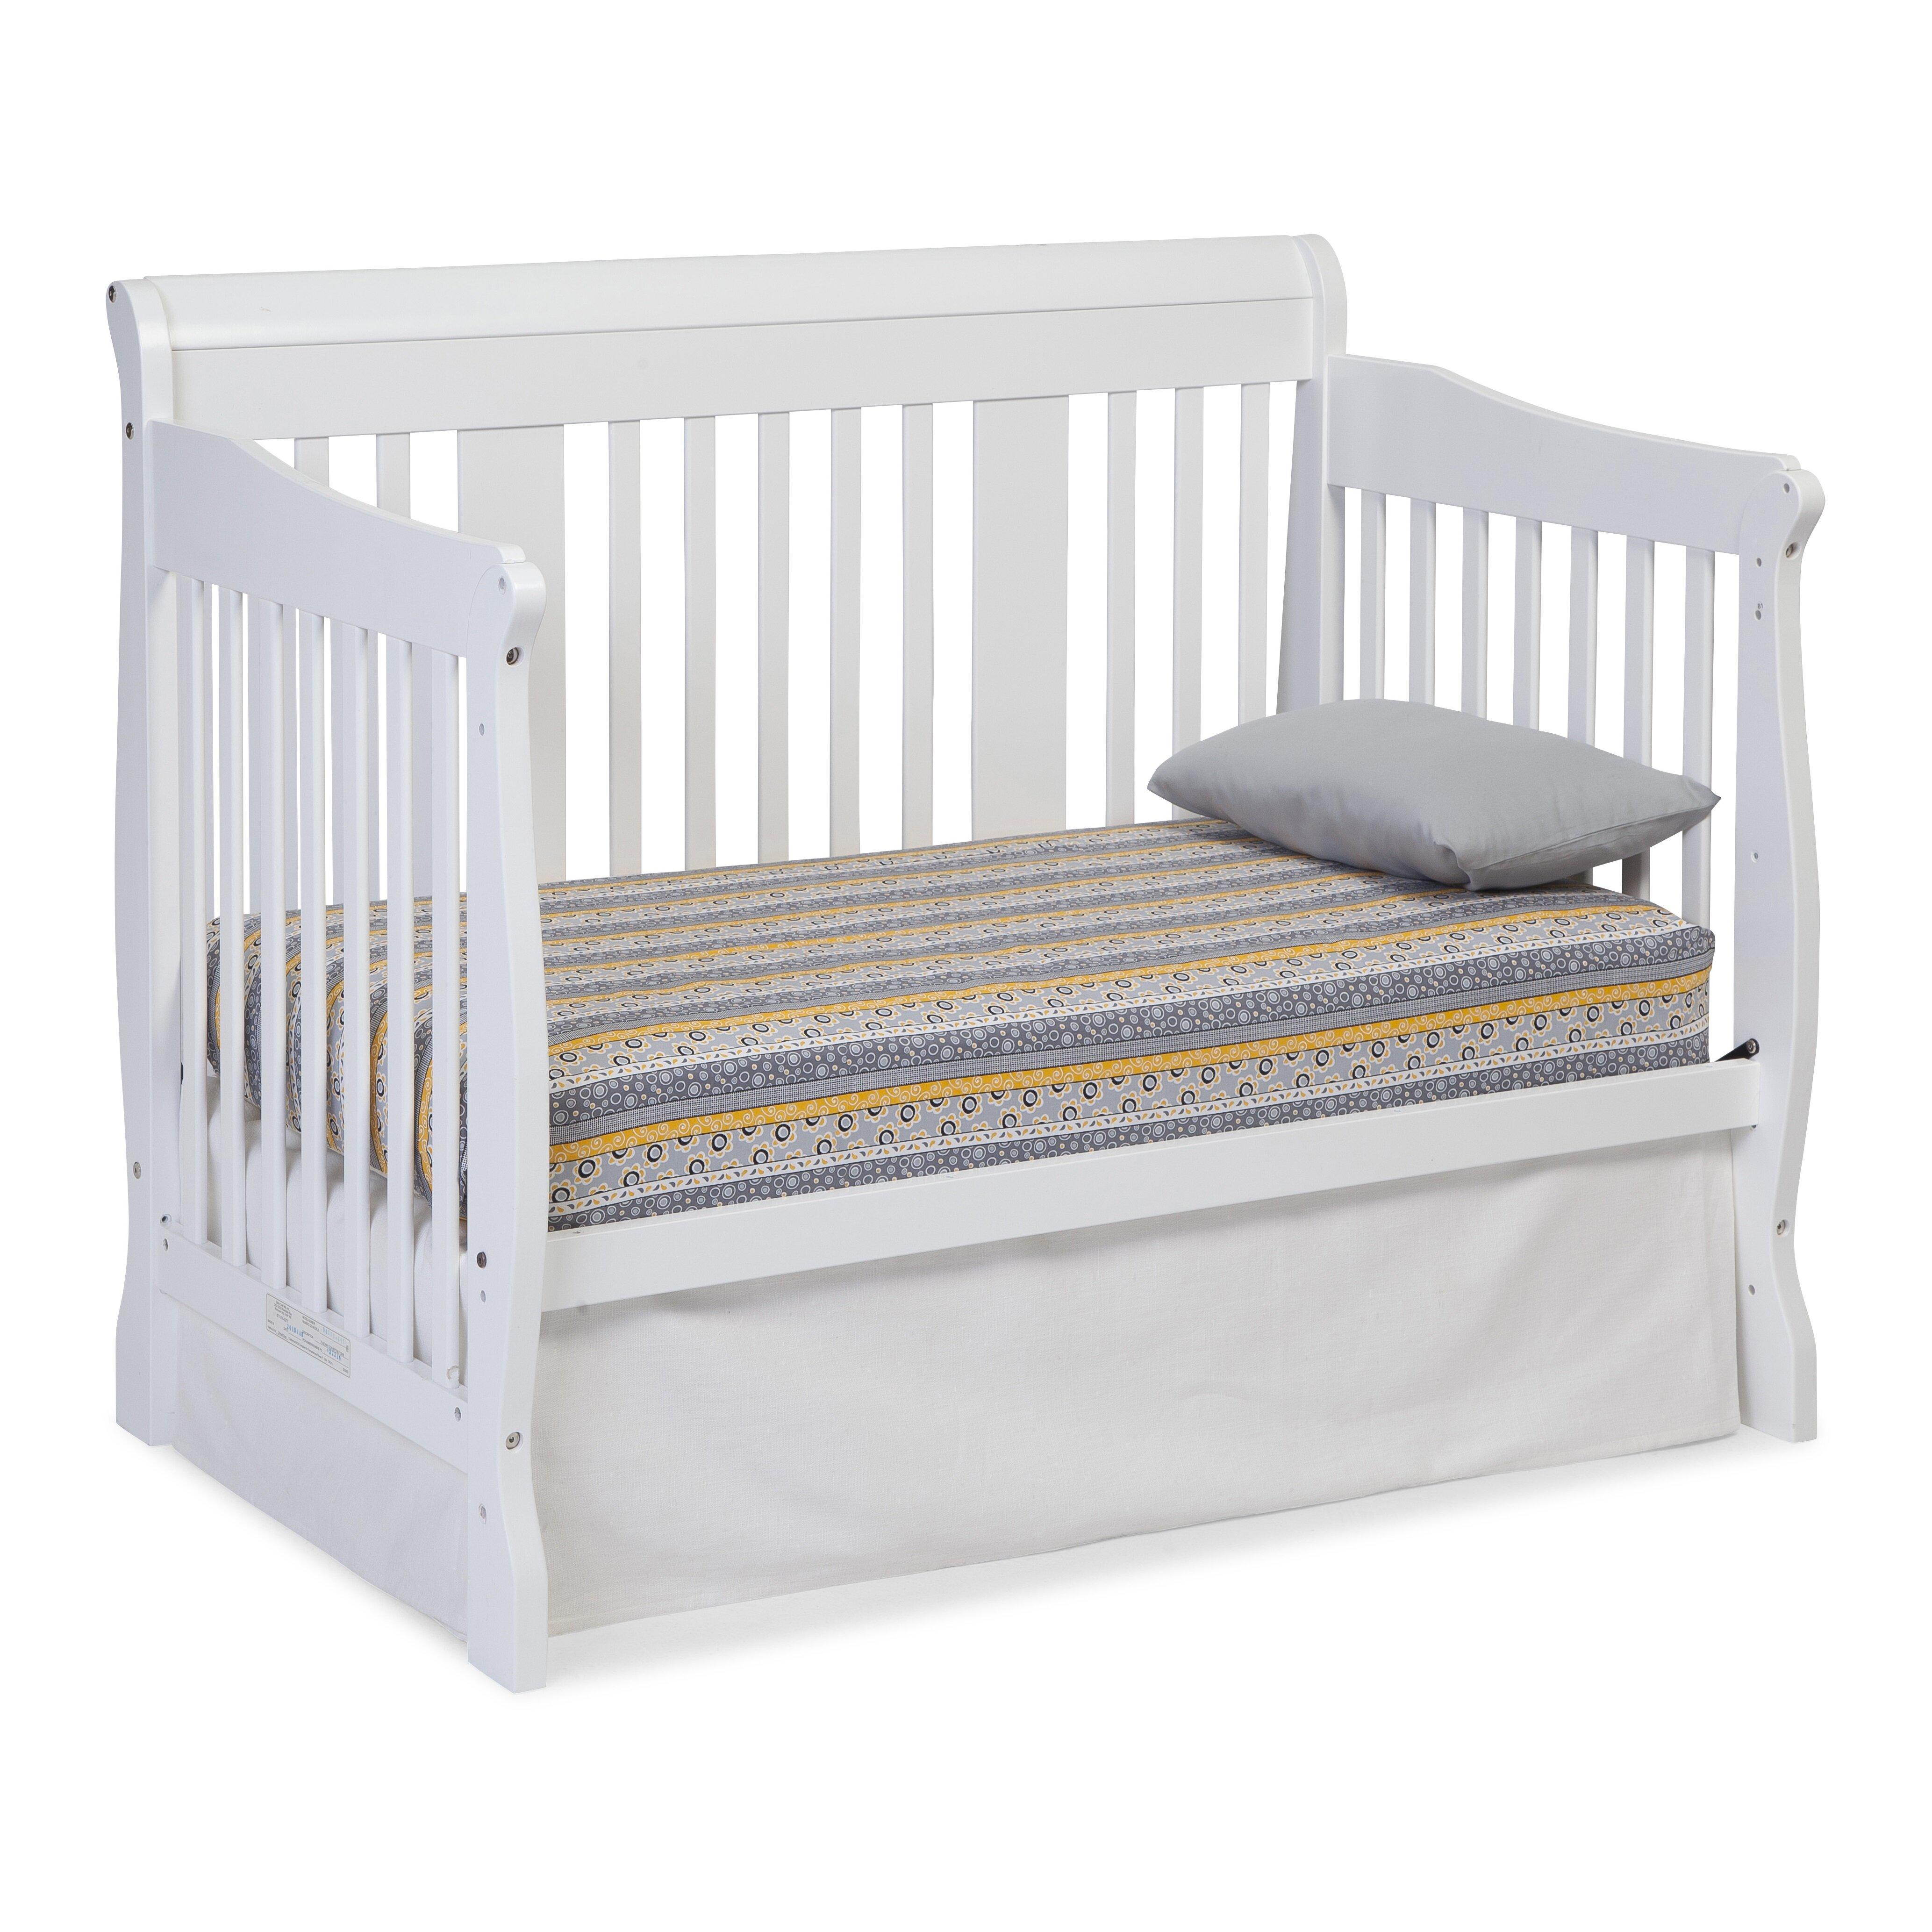 Baby crib for sale ottawa - Convertible Cribs Storkcraft Sku Kd1477